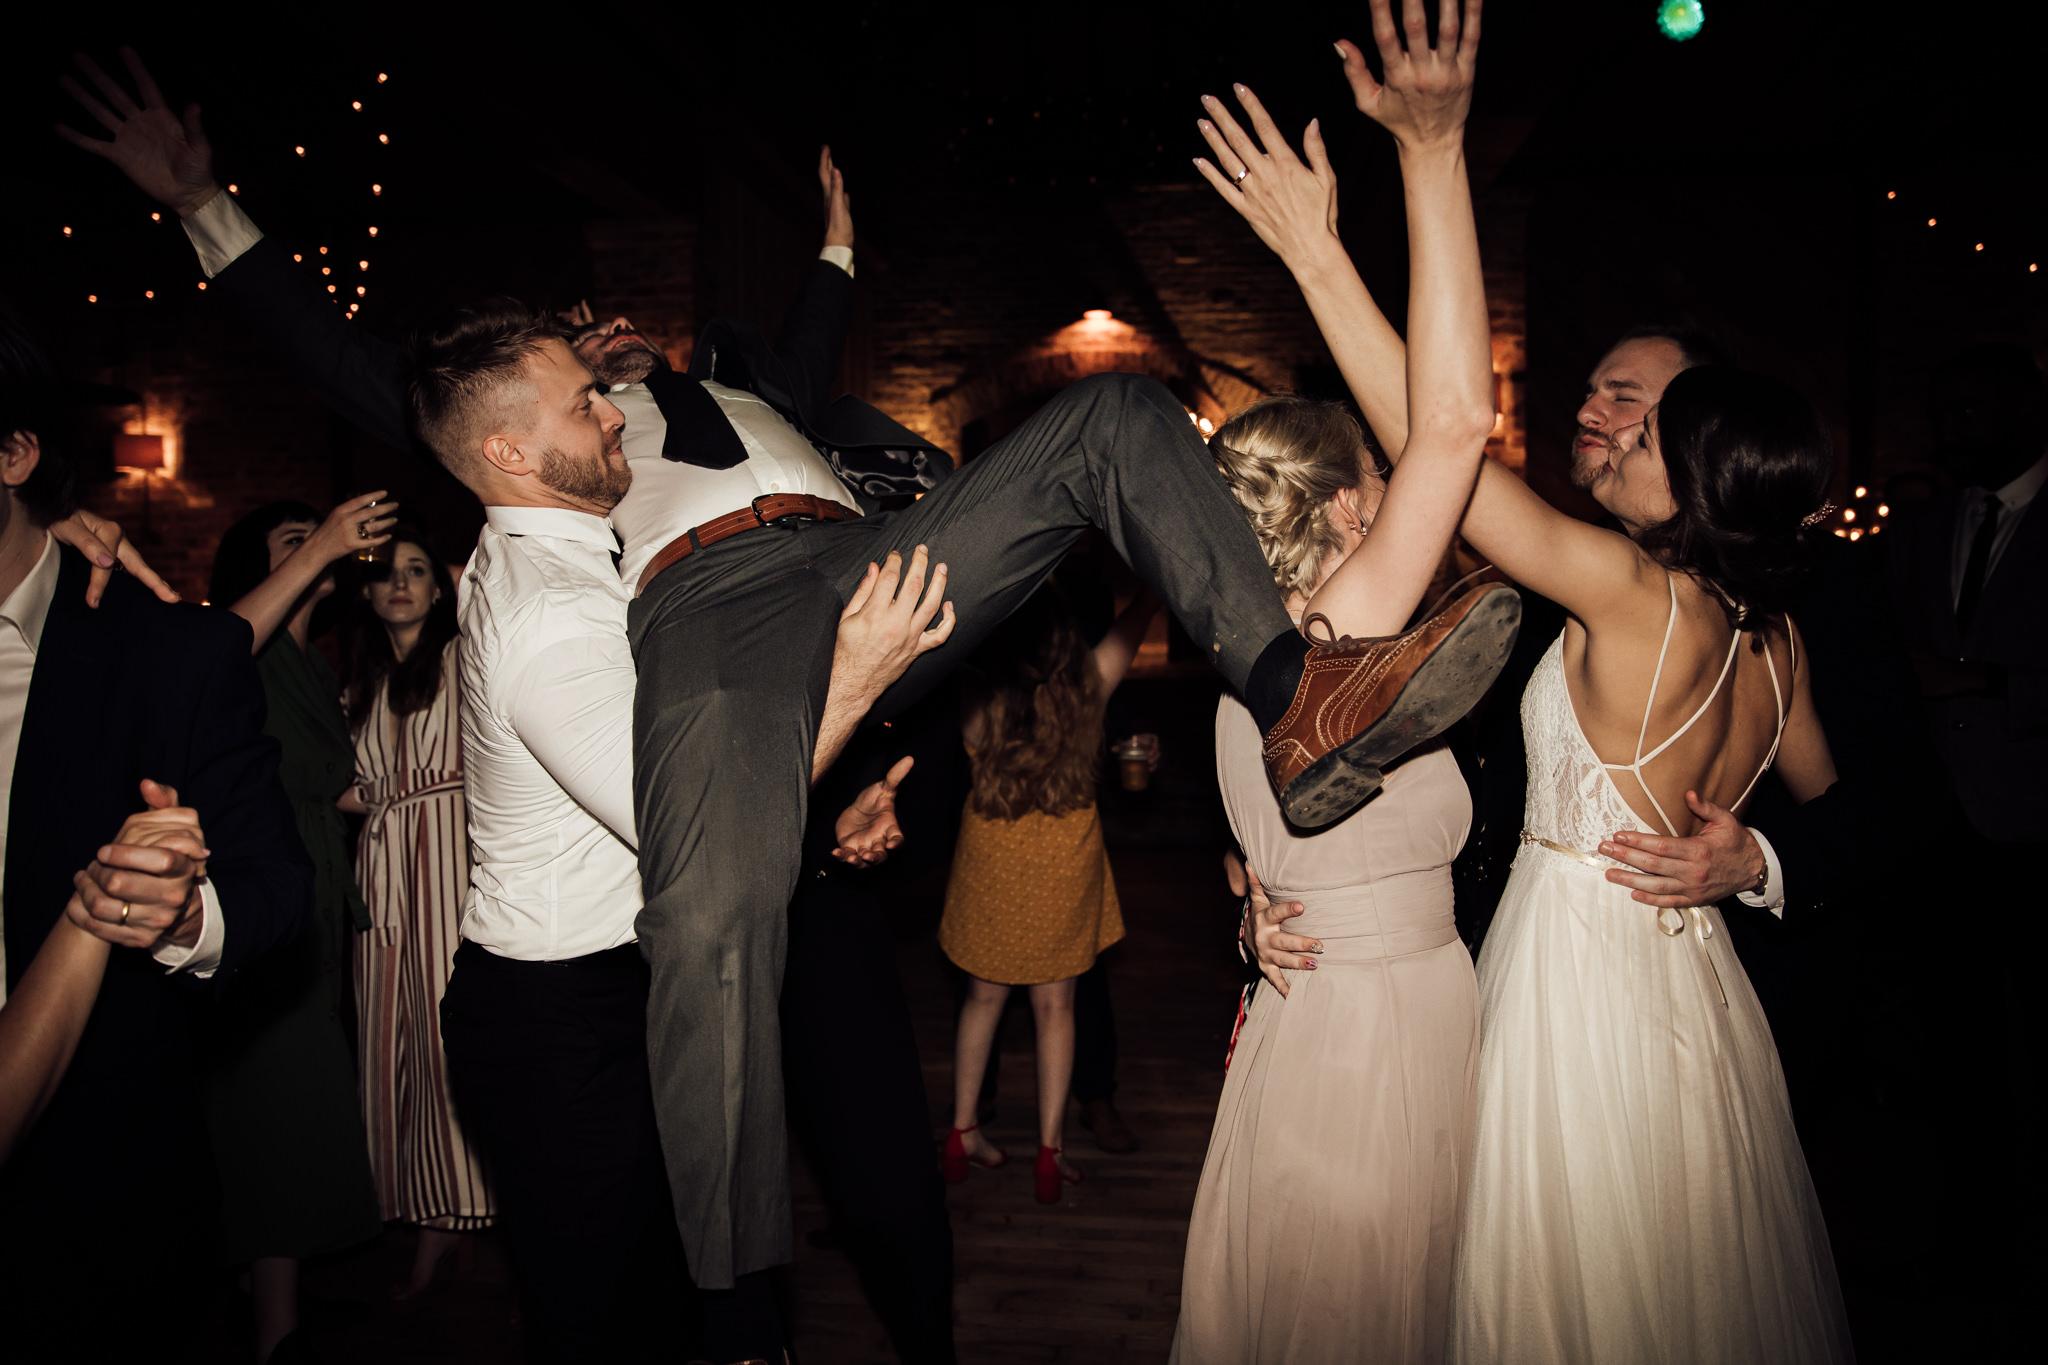 phantom-canyon-brewery-colorado-springs-wedding-photographer-480.jpg